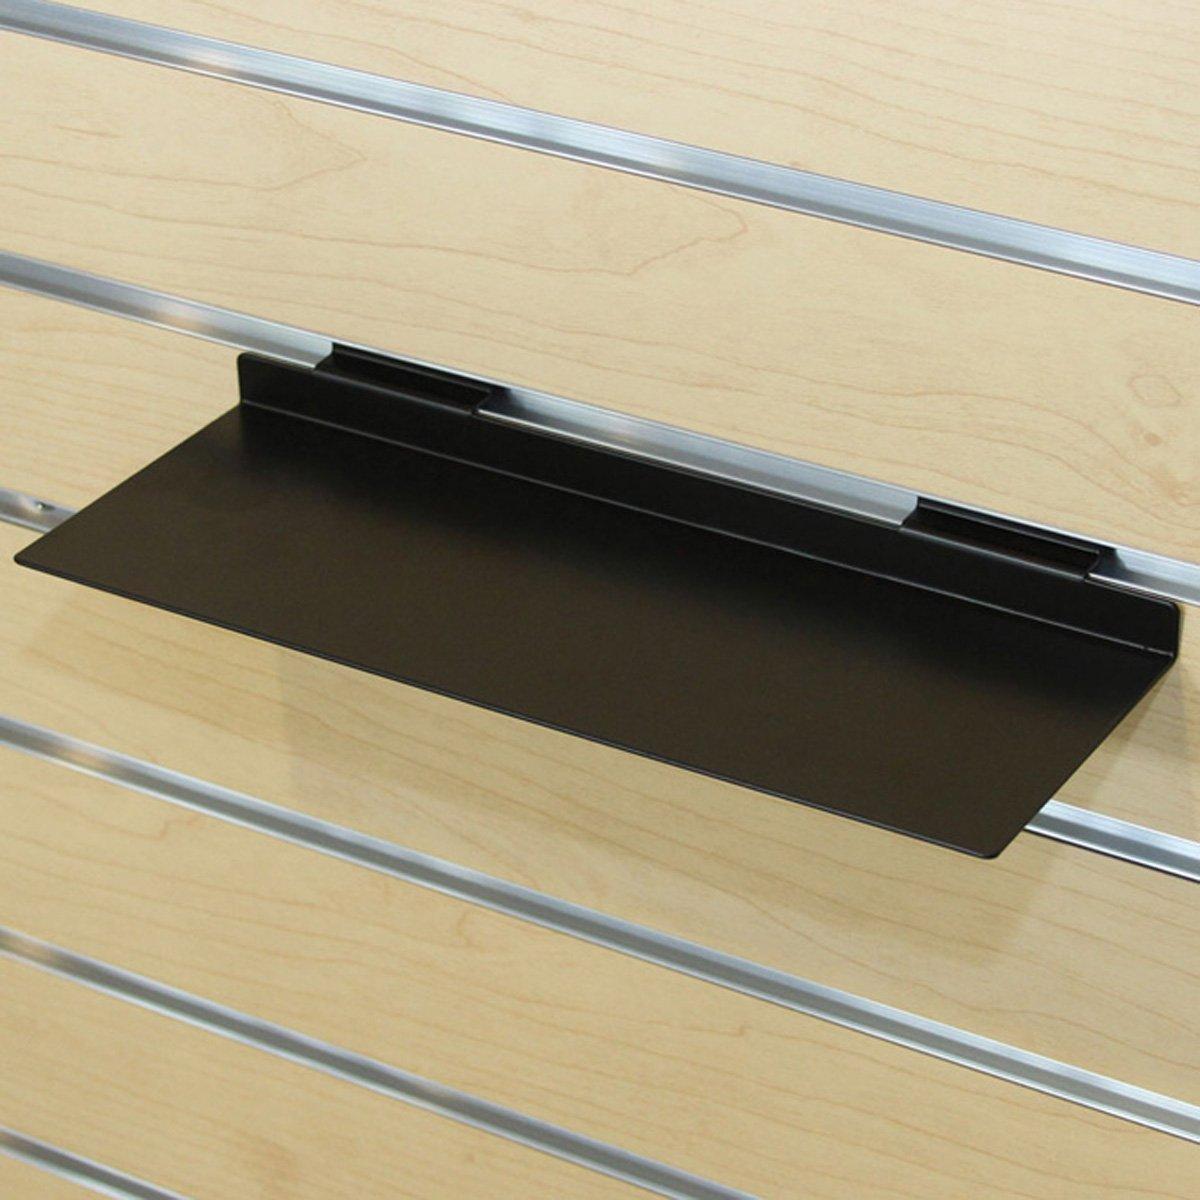 Slatwall Metal Shoes Display Shelf Retail Store Fixture Black Lot of 10 NEW